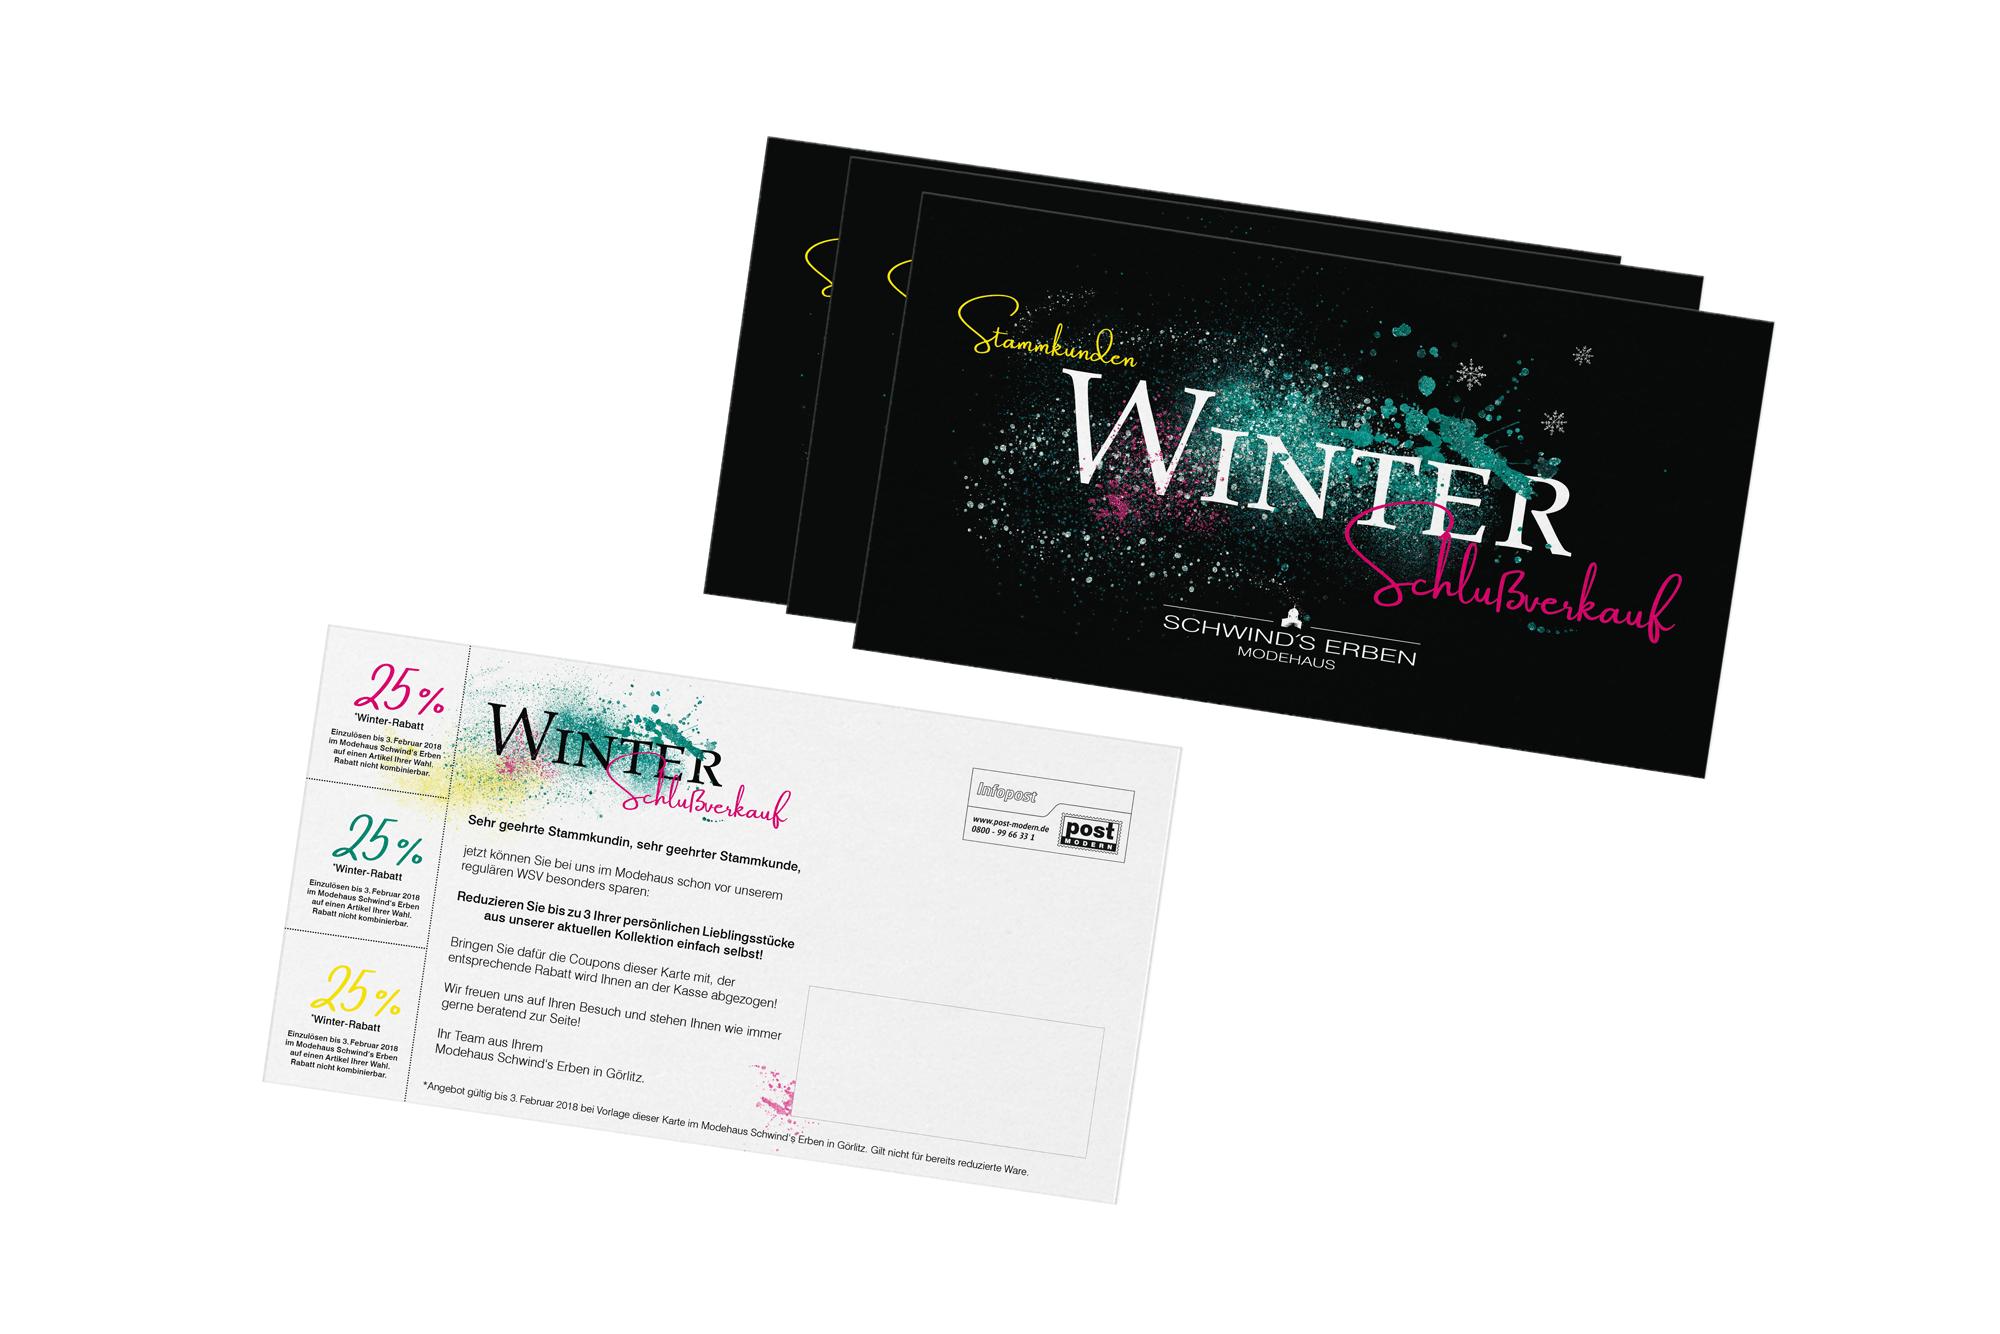 Werbe postkarten werbung grafik design g rlitz for Grafik designer